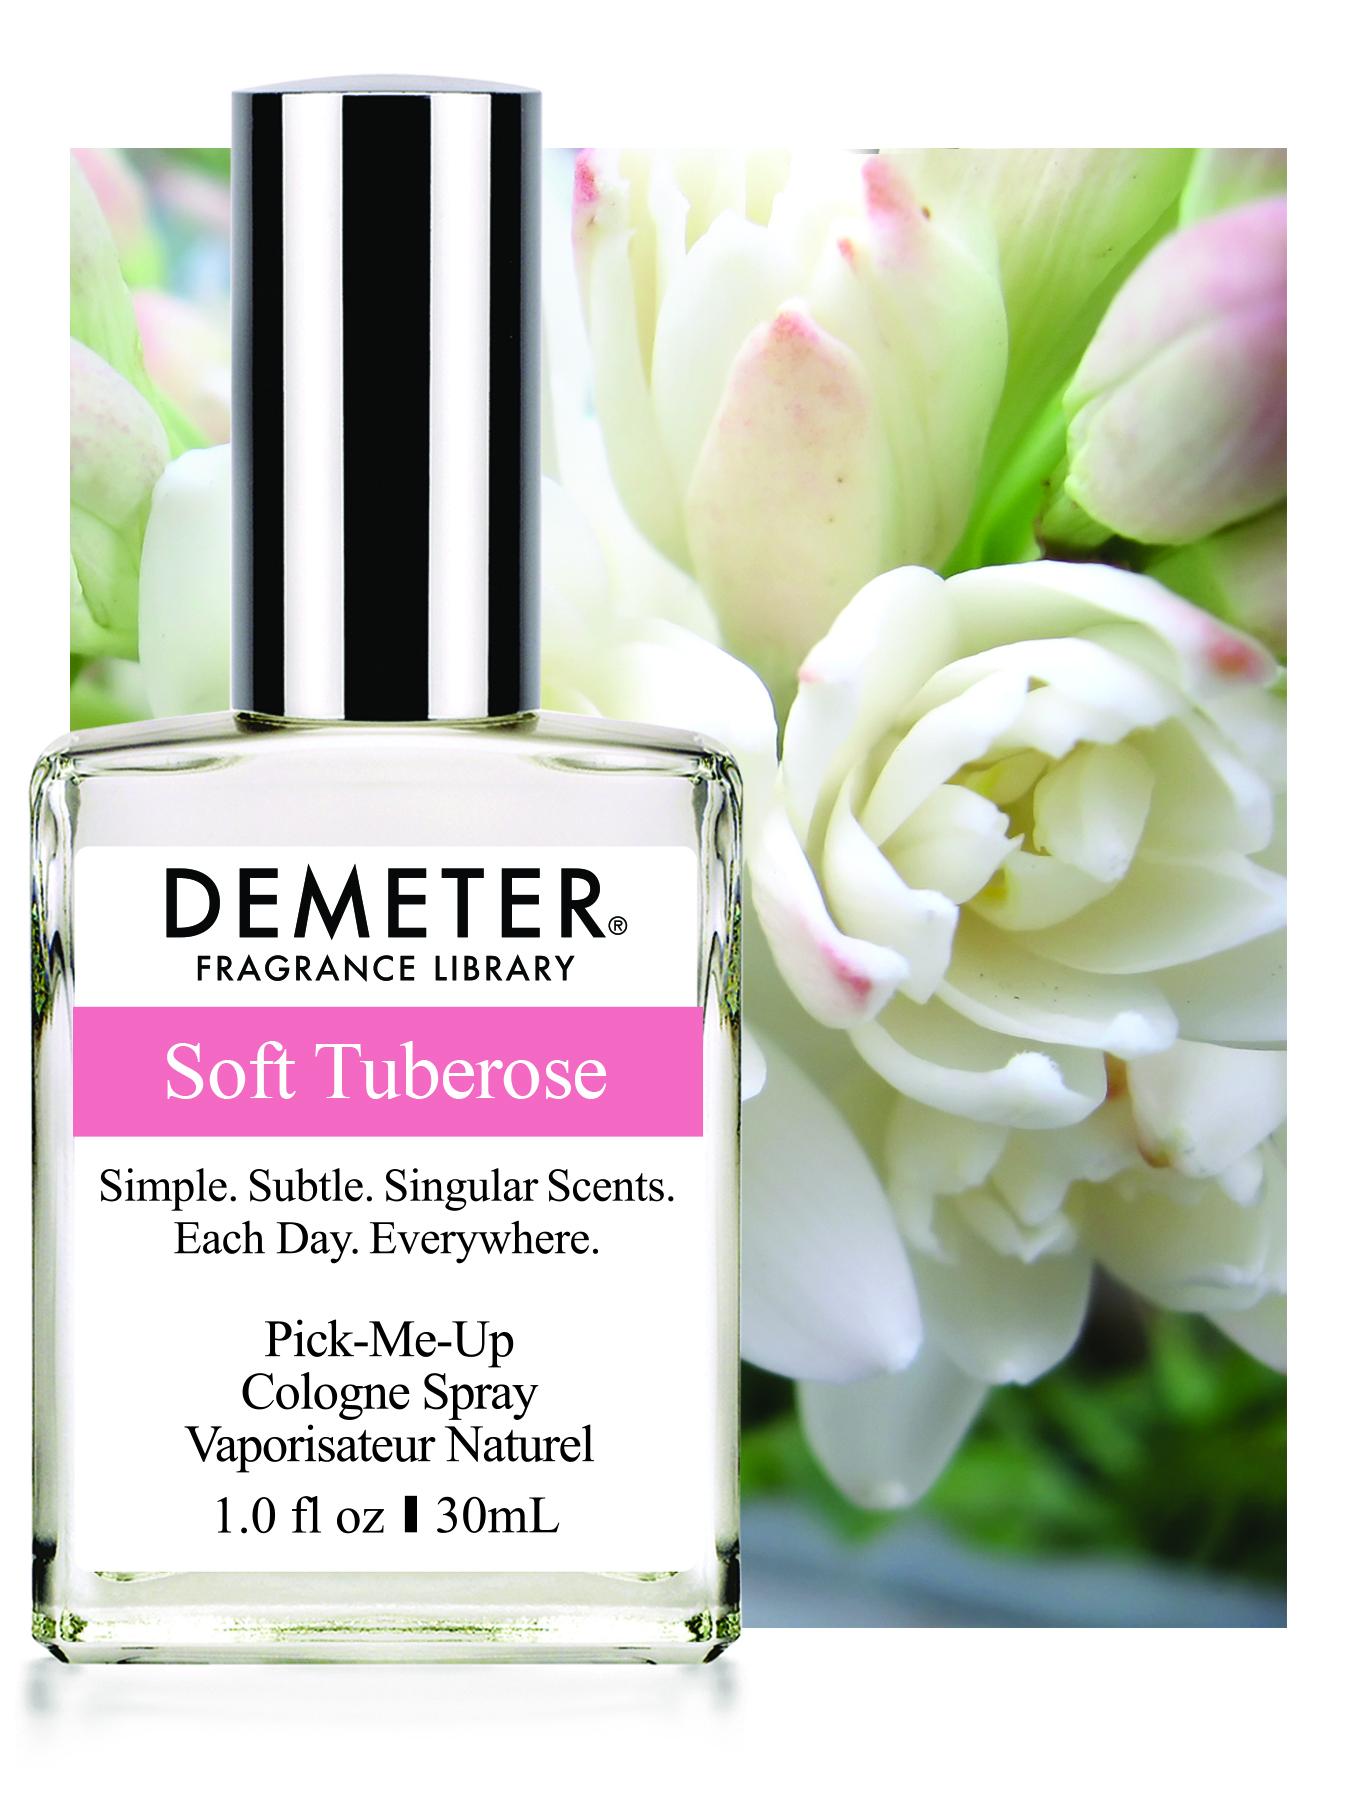 Tuberose soft demeter fragrance library izmirmasajfo